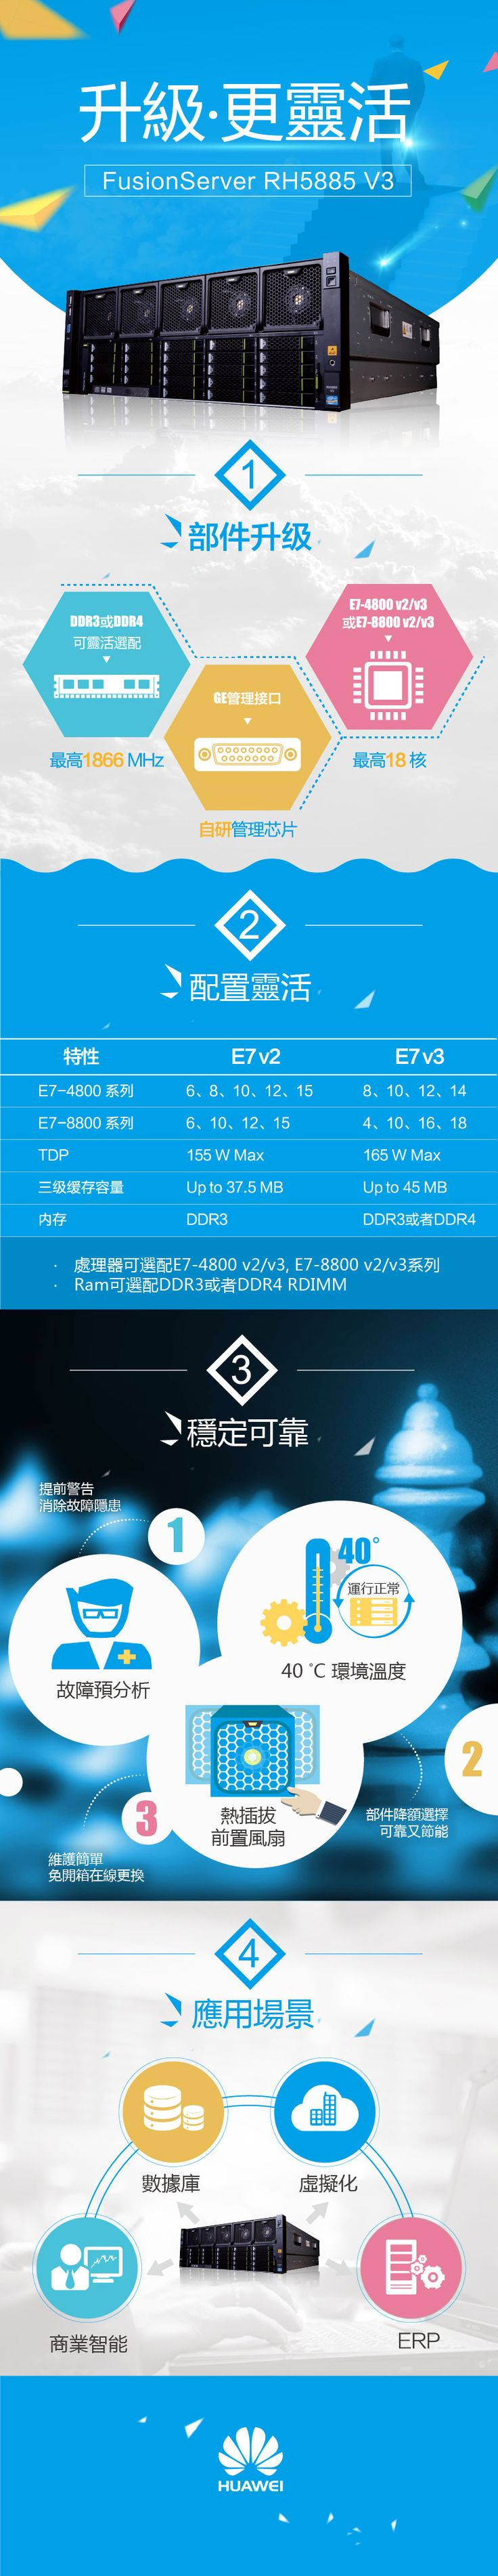 FusionServer RH5885 V3是新一代4U 4路機架服務器。它支持Intel® Xeon® E7 v2或v3系列處理器,可提供72個計算核心,通過處理器、內存、I/O、硬盤的靈活配置,以優化的性能,滿足數據庫、ERP、商業智能分析、大數據、虛擬化等業務需求。